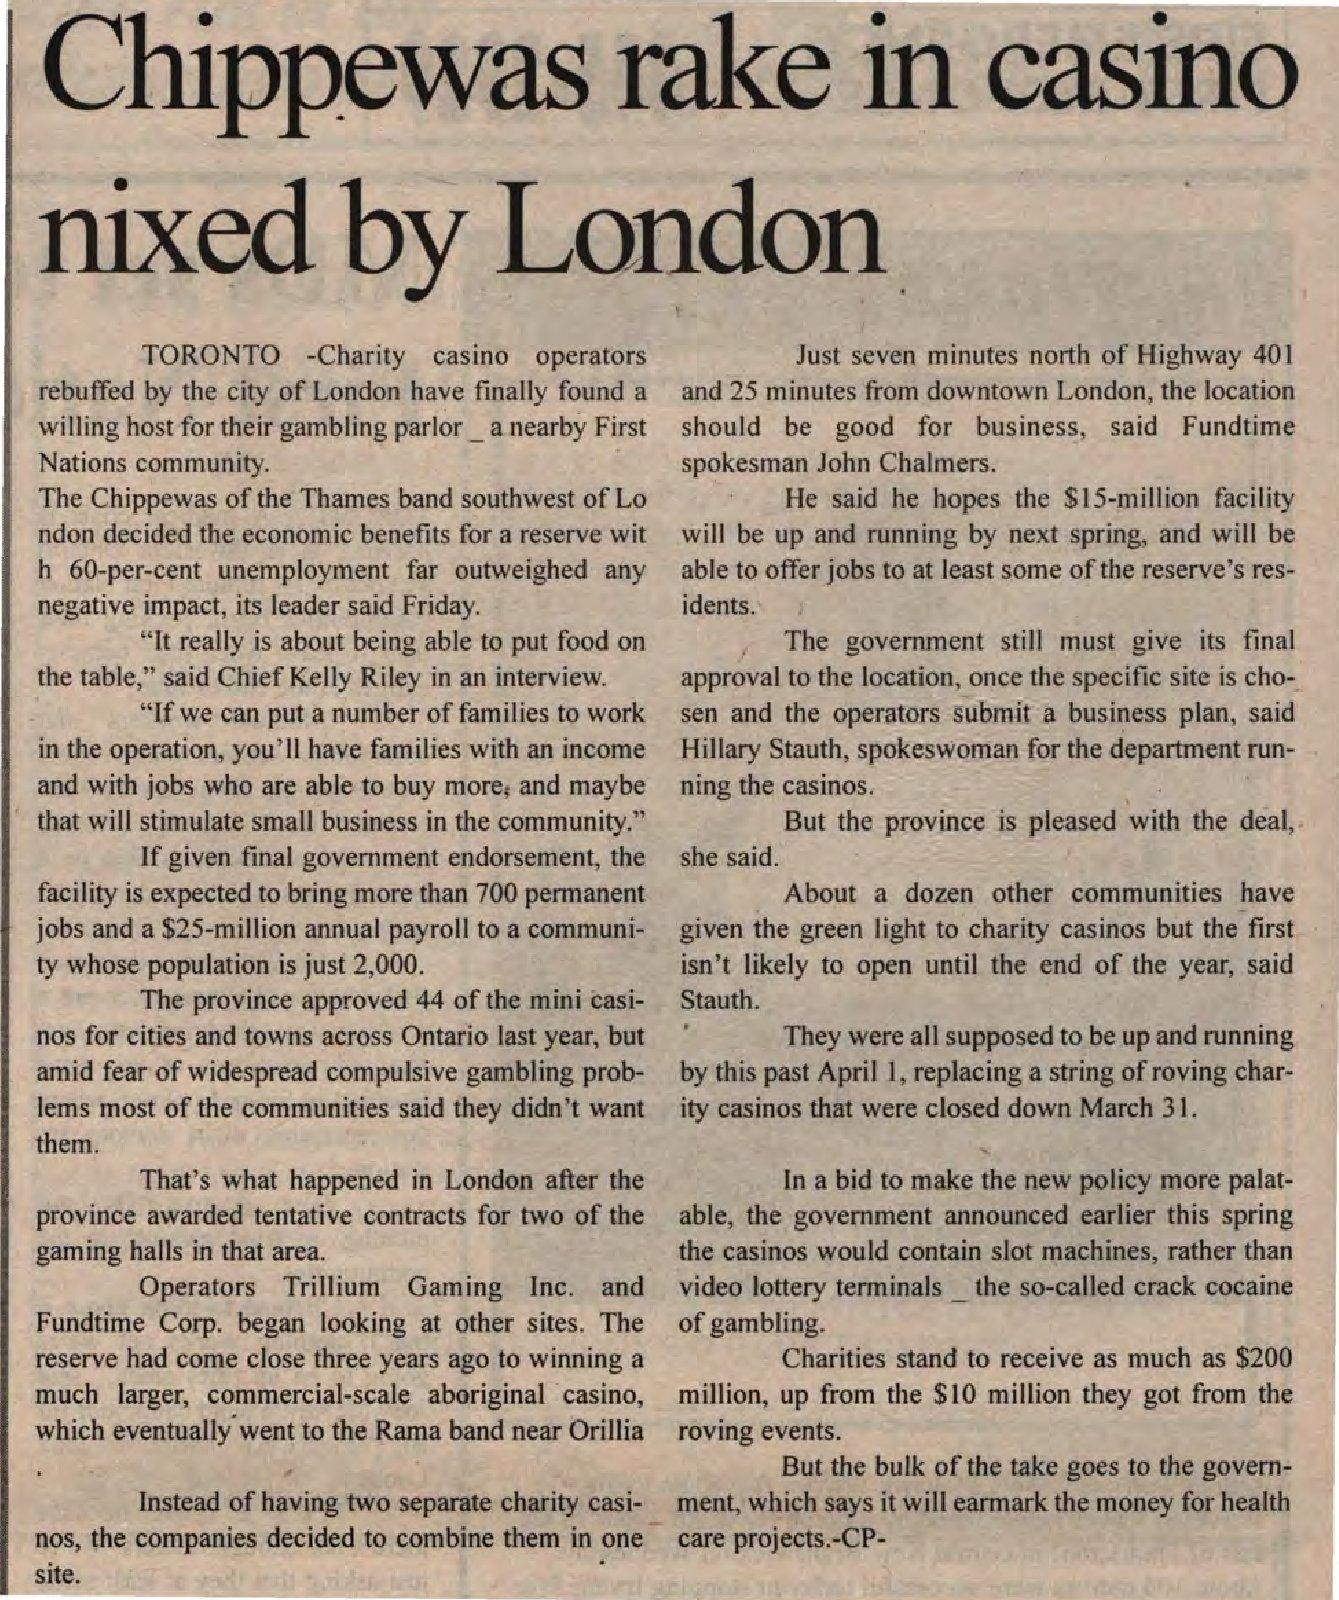 """Chippewas rake in casino nixed by London"""